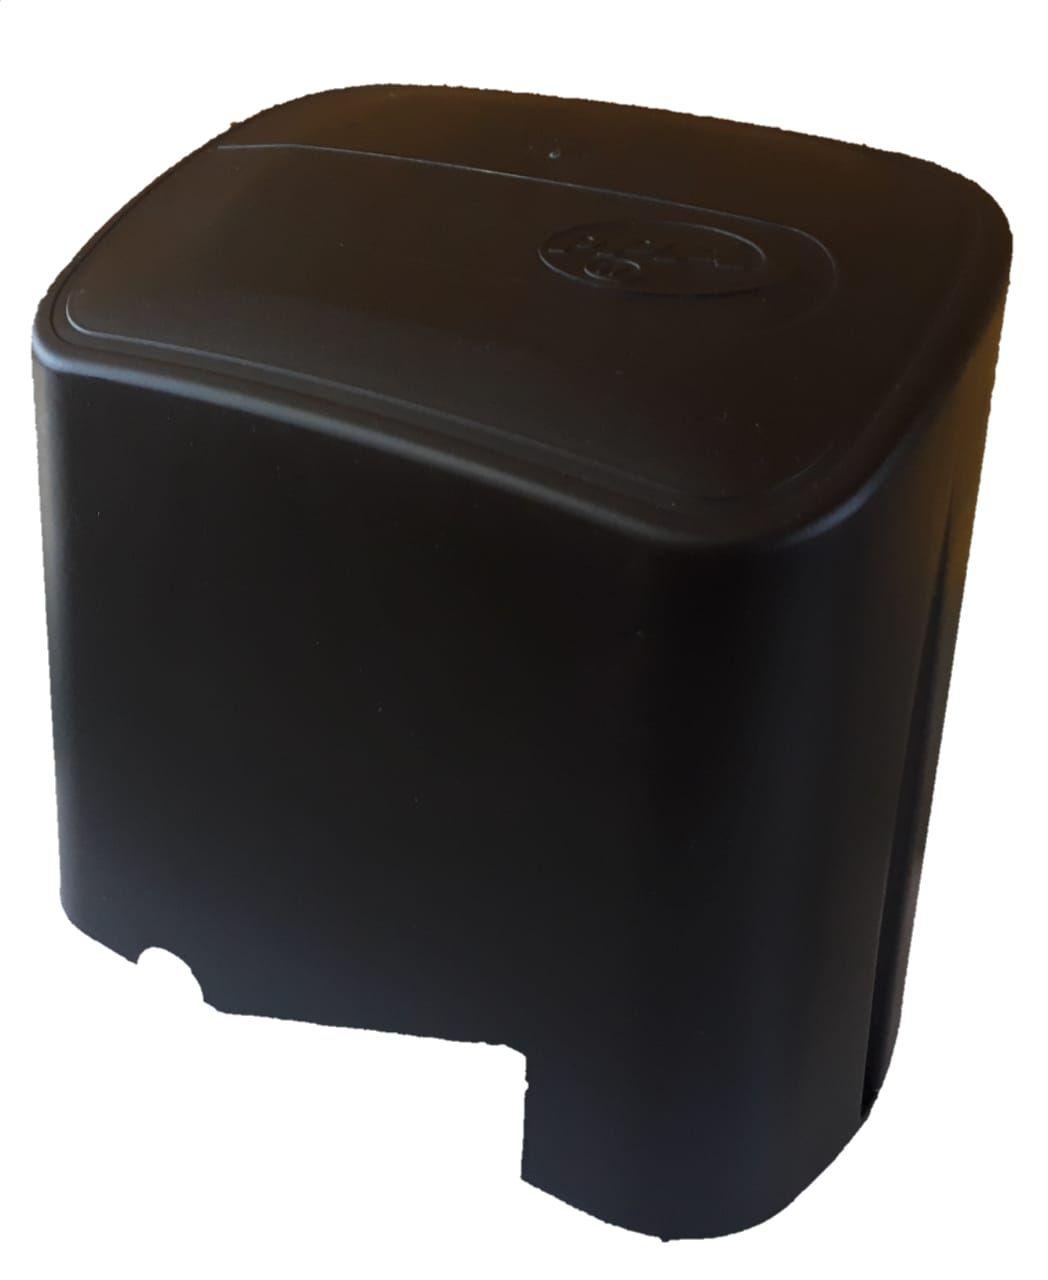 Capa carenagem tampa para motor DZ Home - PPA